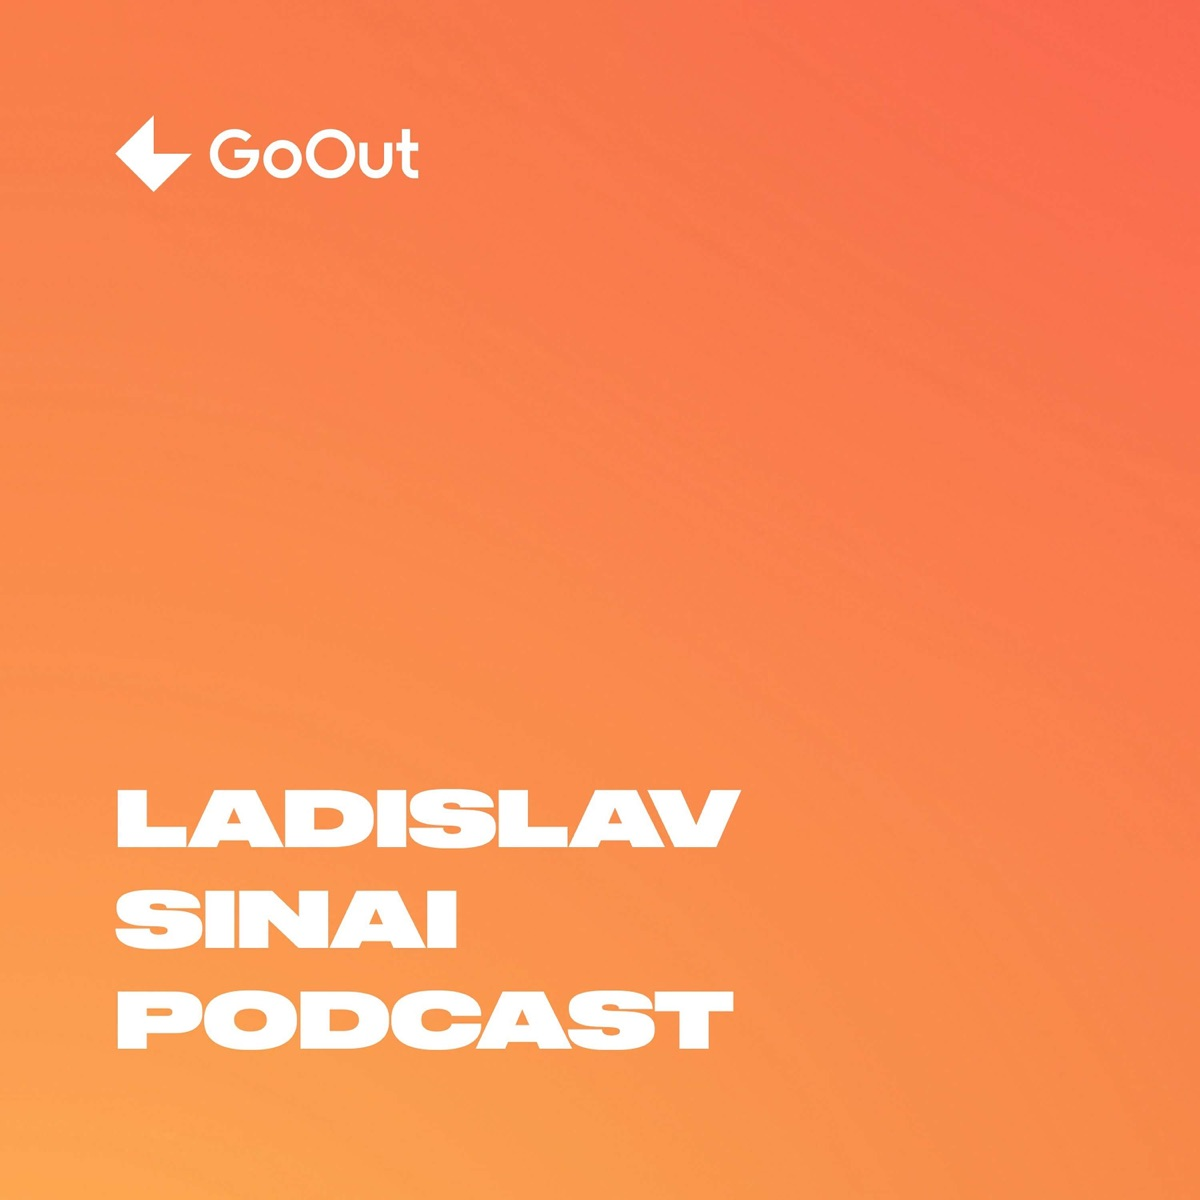 Ladislav Sinai Podcast